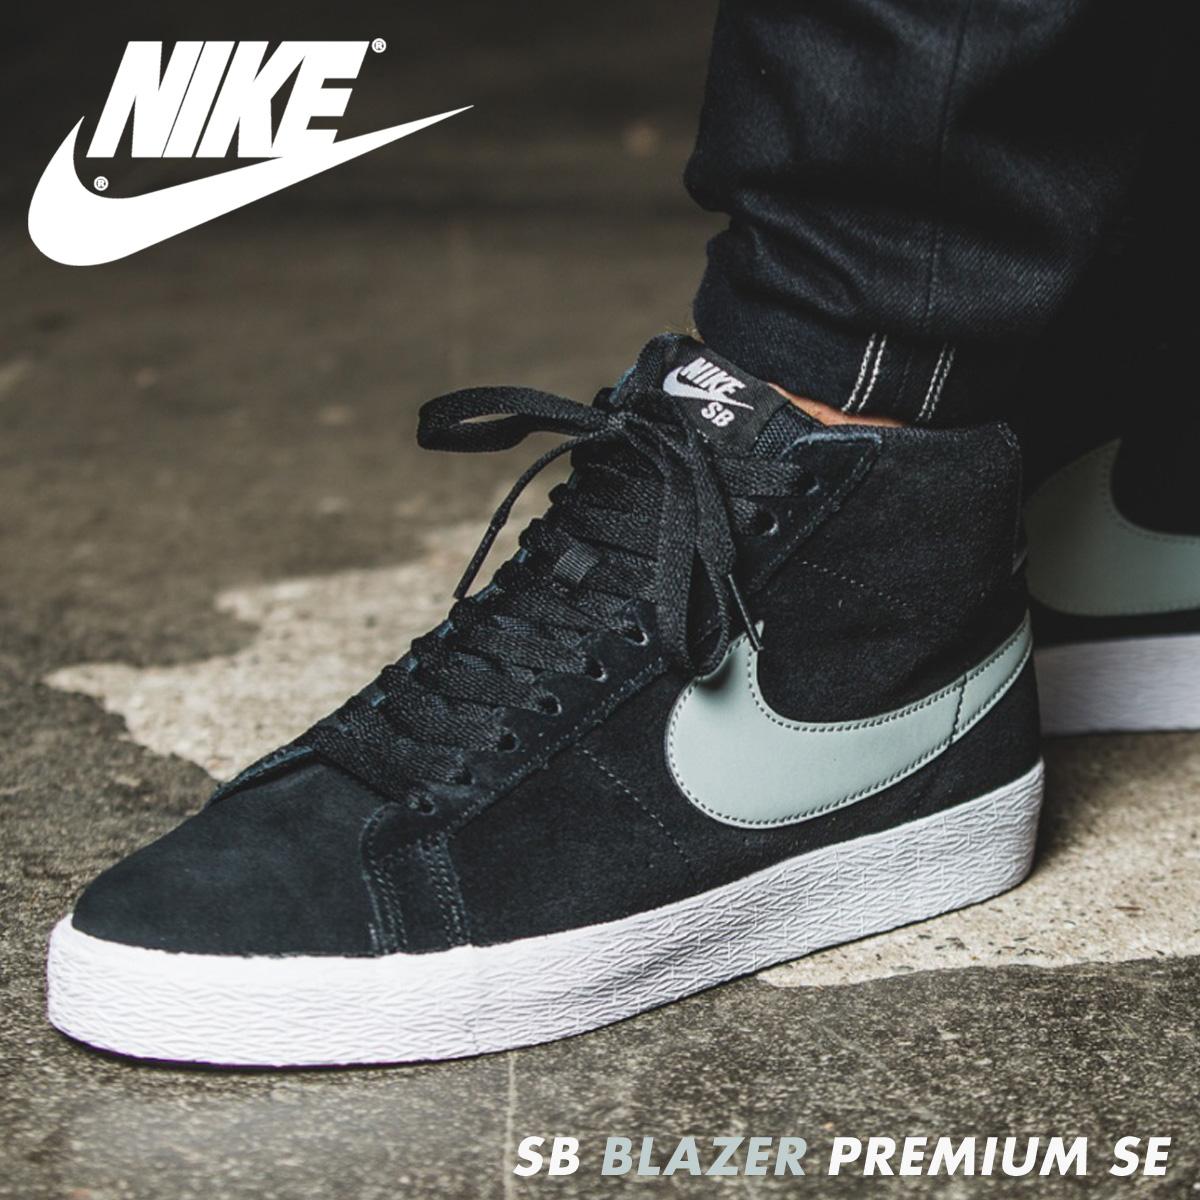 NIKE SB BLEAZER PREMIUM SE Nike blazer sneakers men black 631,042 003